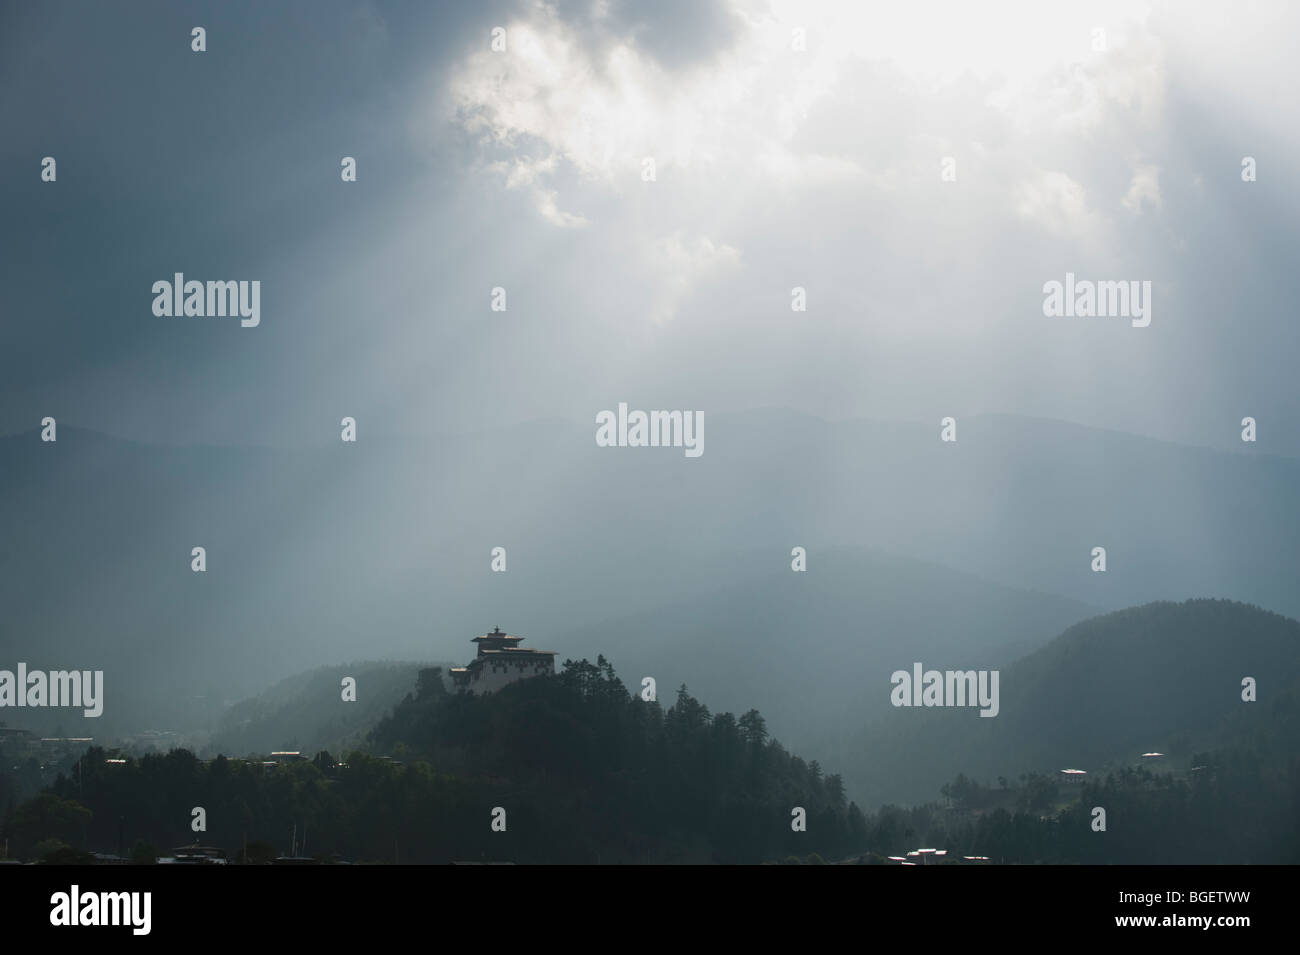 Clearing Storm over Jakar Dzong, Bumthang Valley, BHUTAN - Stock Image